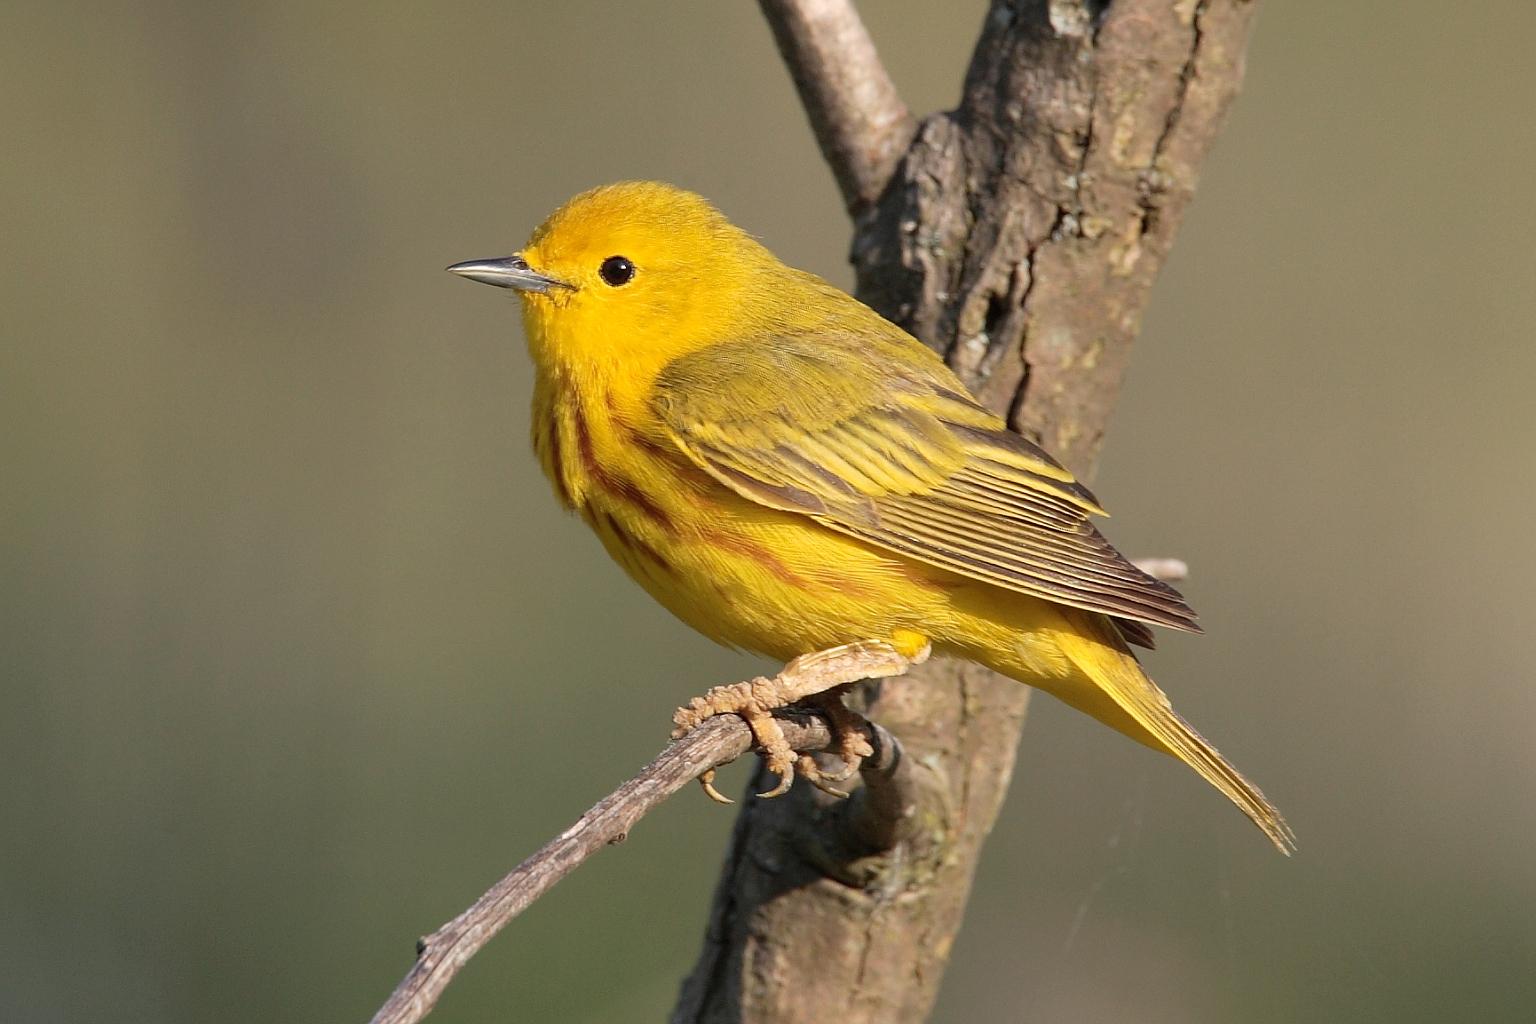 Dendroica-aestiva-001 yellow warbler.jpg